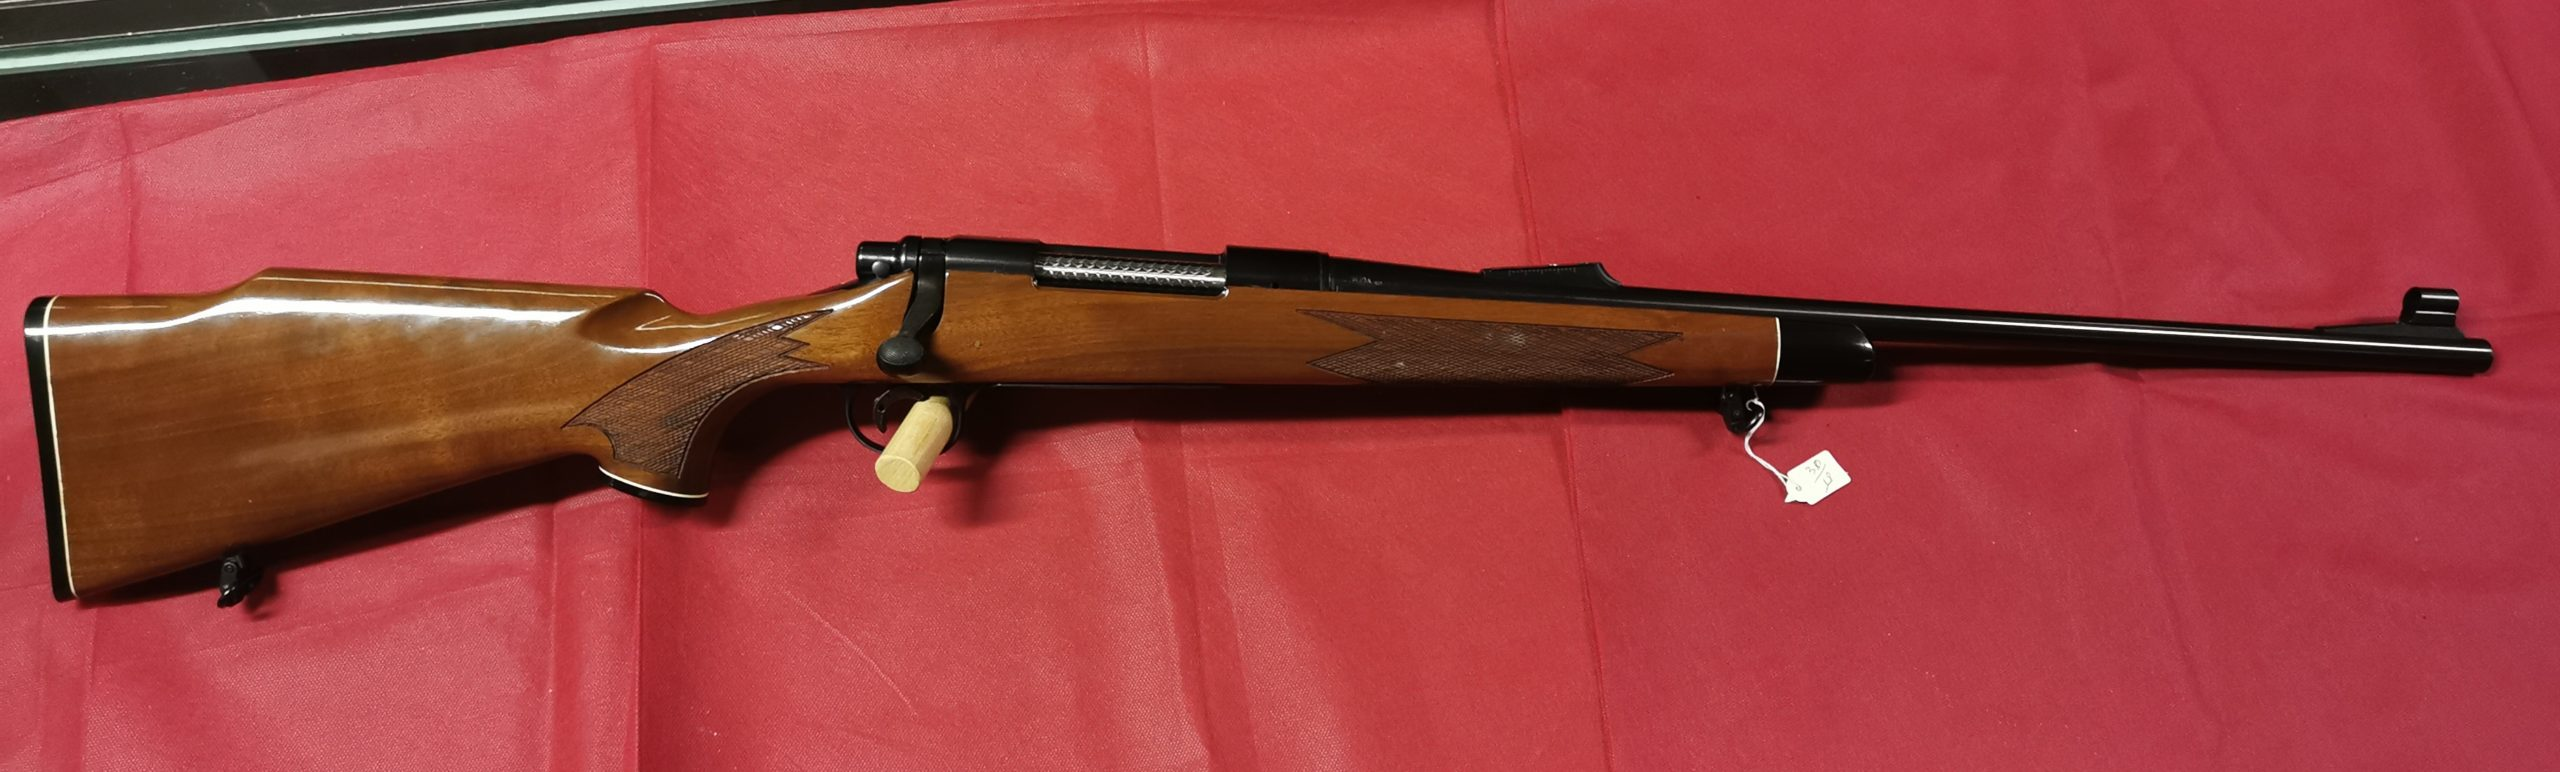 Remington 700 Image